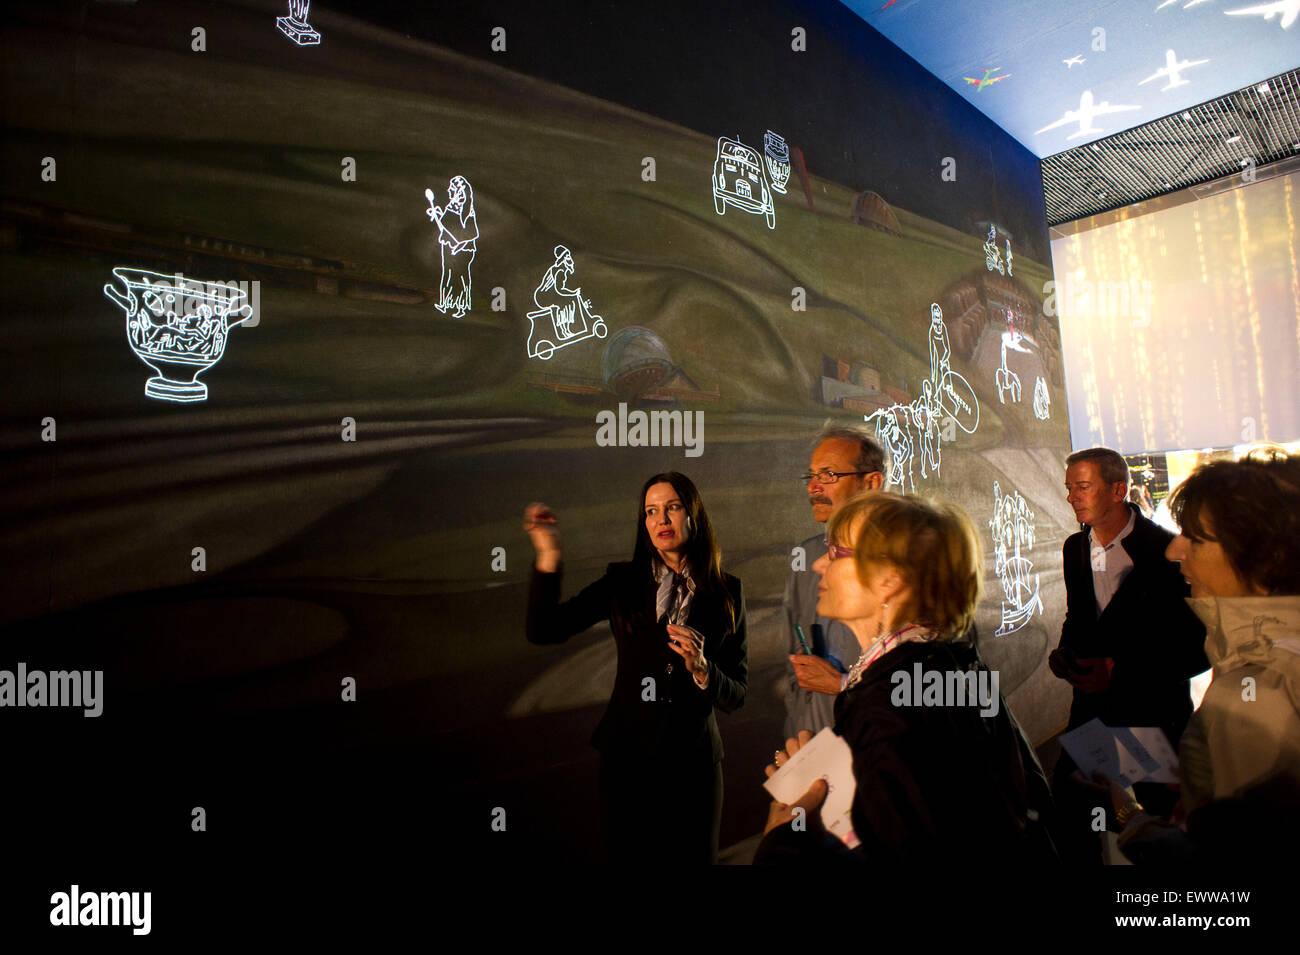 Italy, Milan, Expo 2015, Hall of Wine Italy, the presence of art in the pavilion's history, sociability, love. - Stock Image